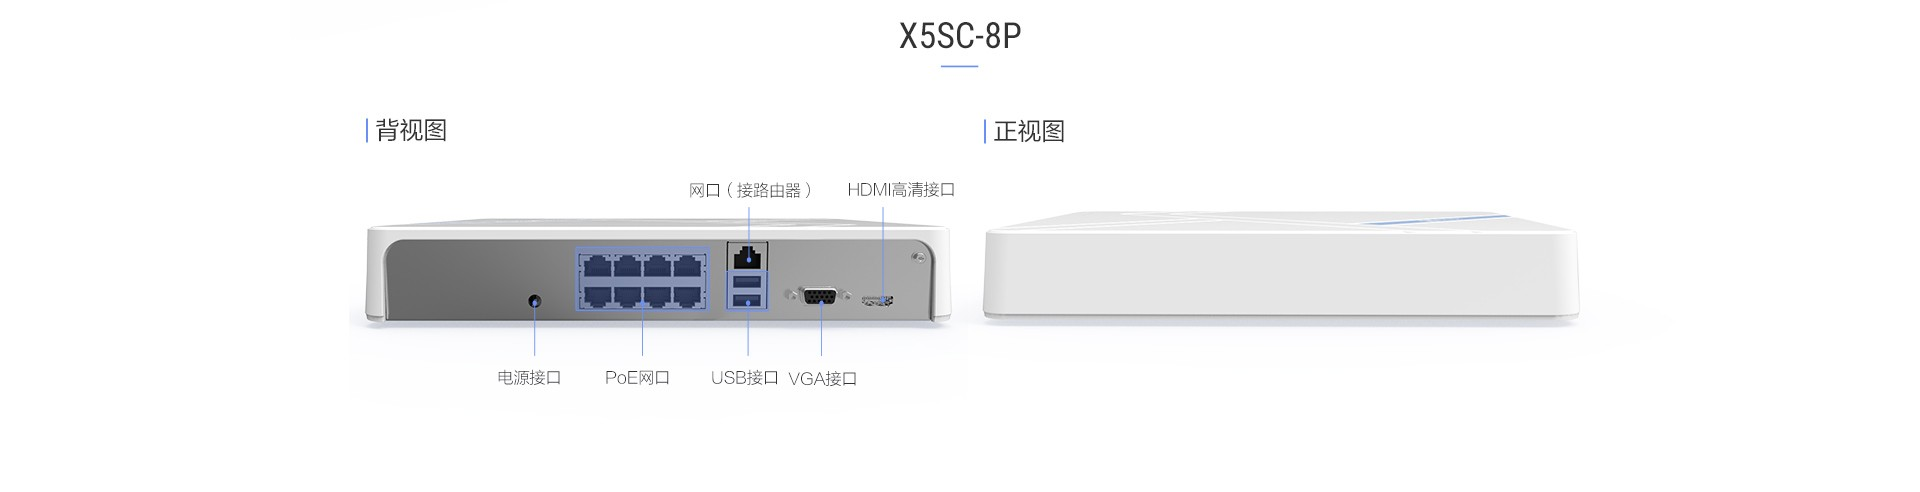 C3T+X5SC-web_24.jpg